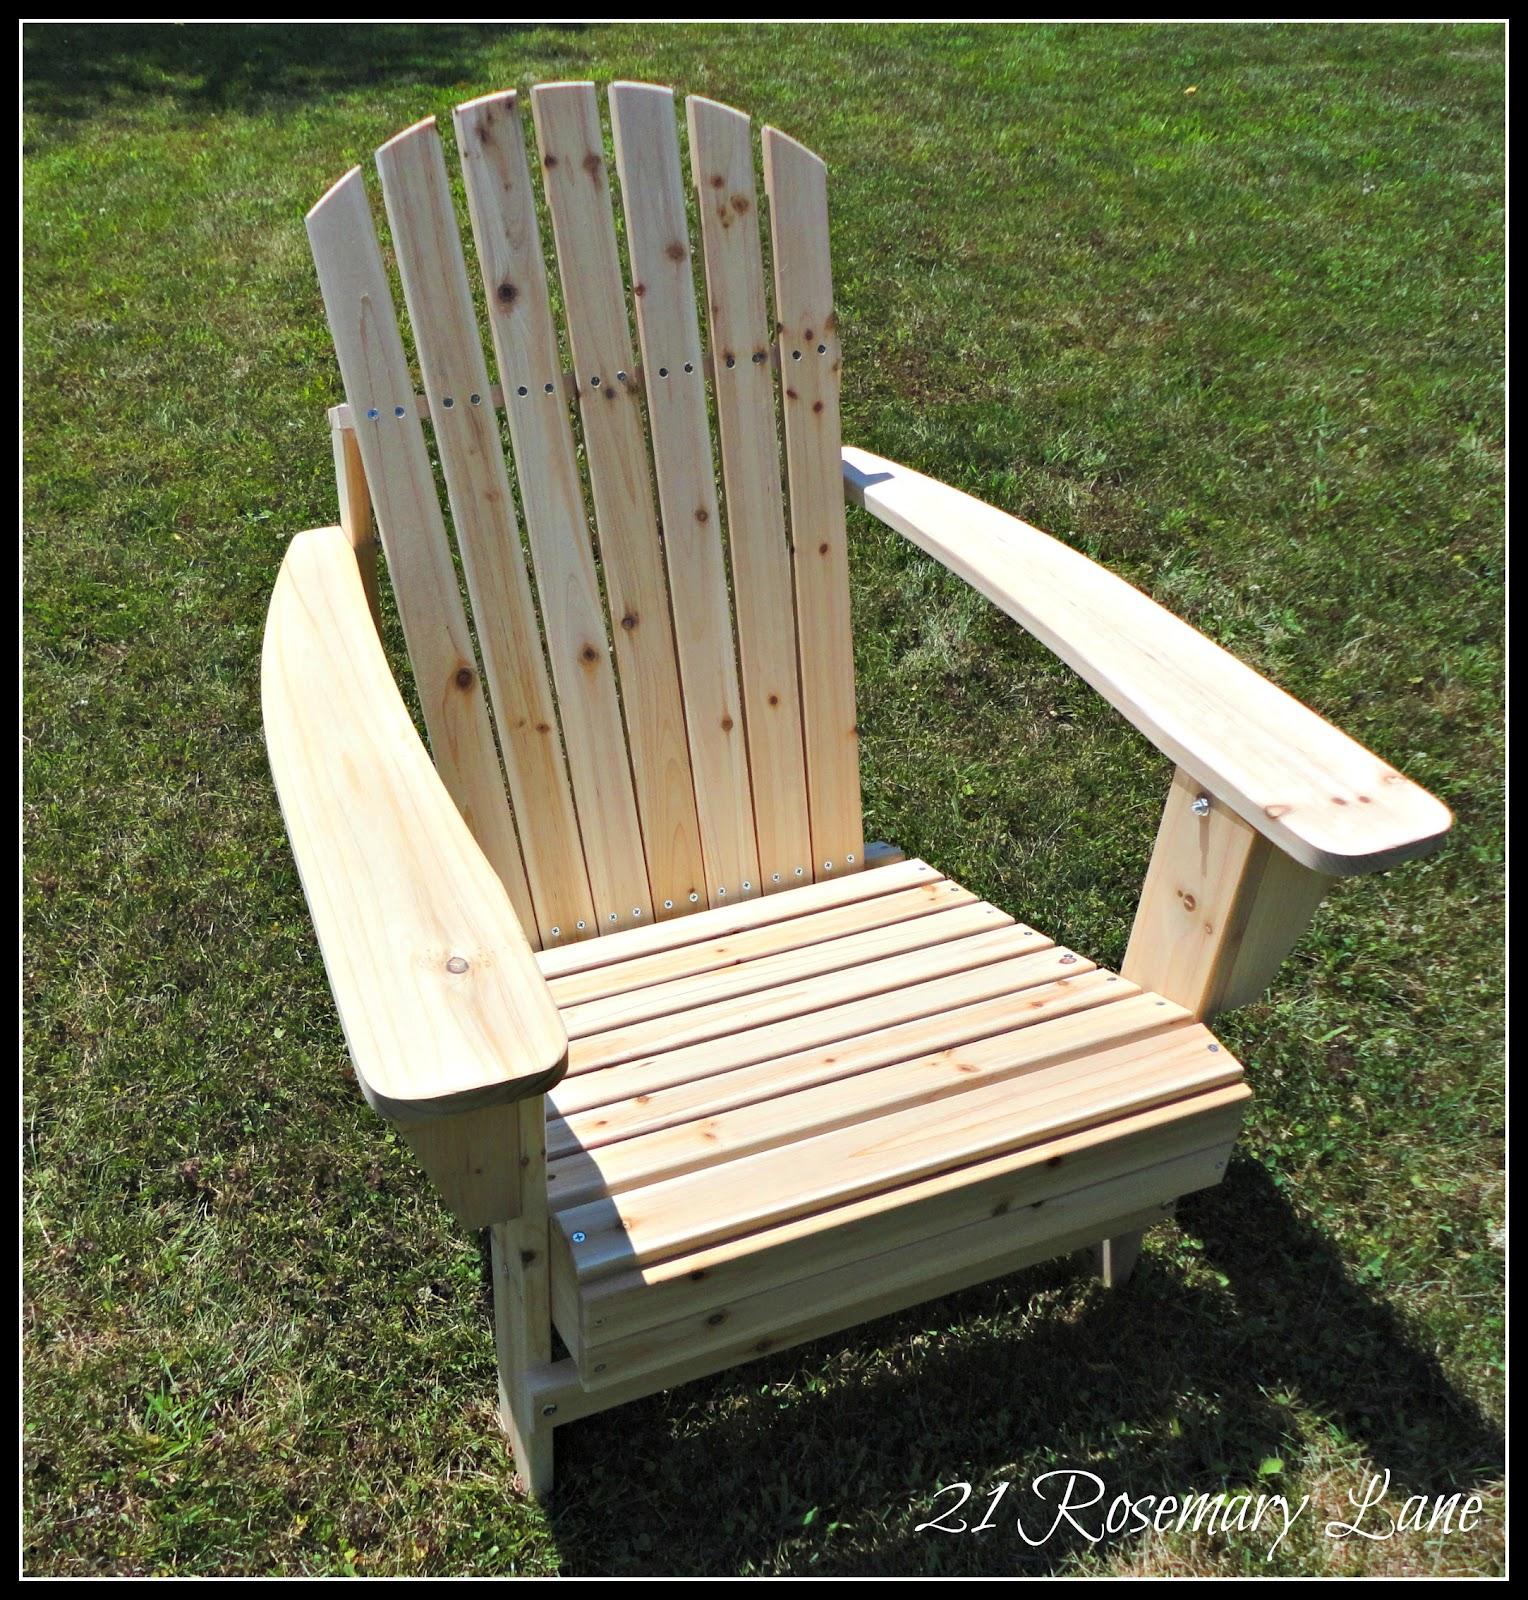 Paint For Adirondack Chairs Bar Height 21 Rosemary Lane My Freshly Painted